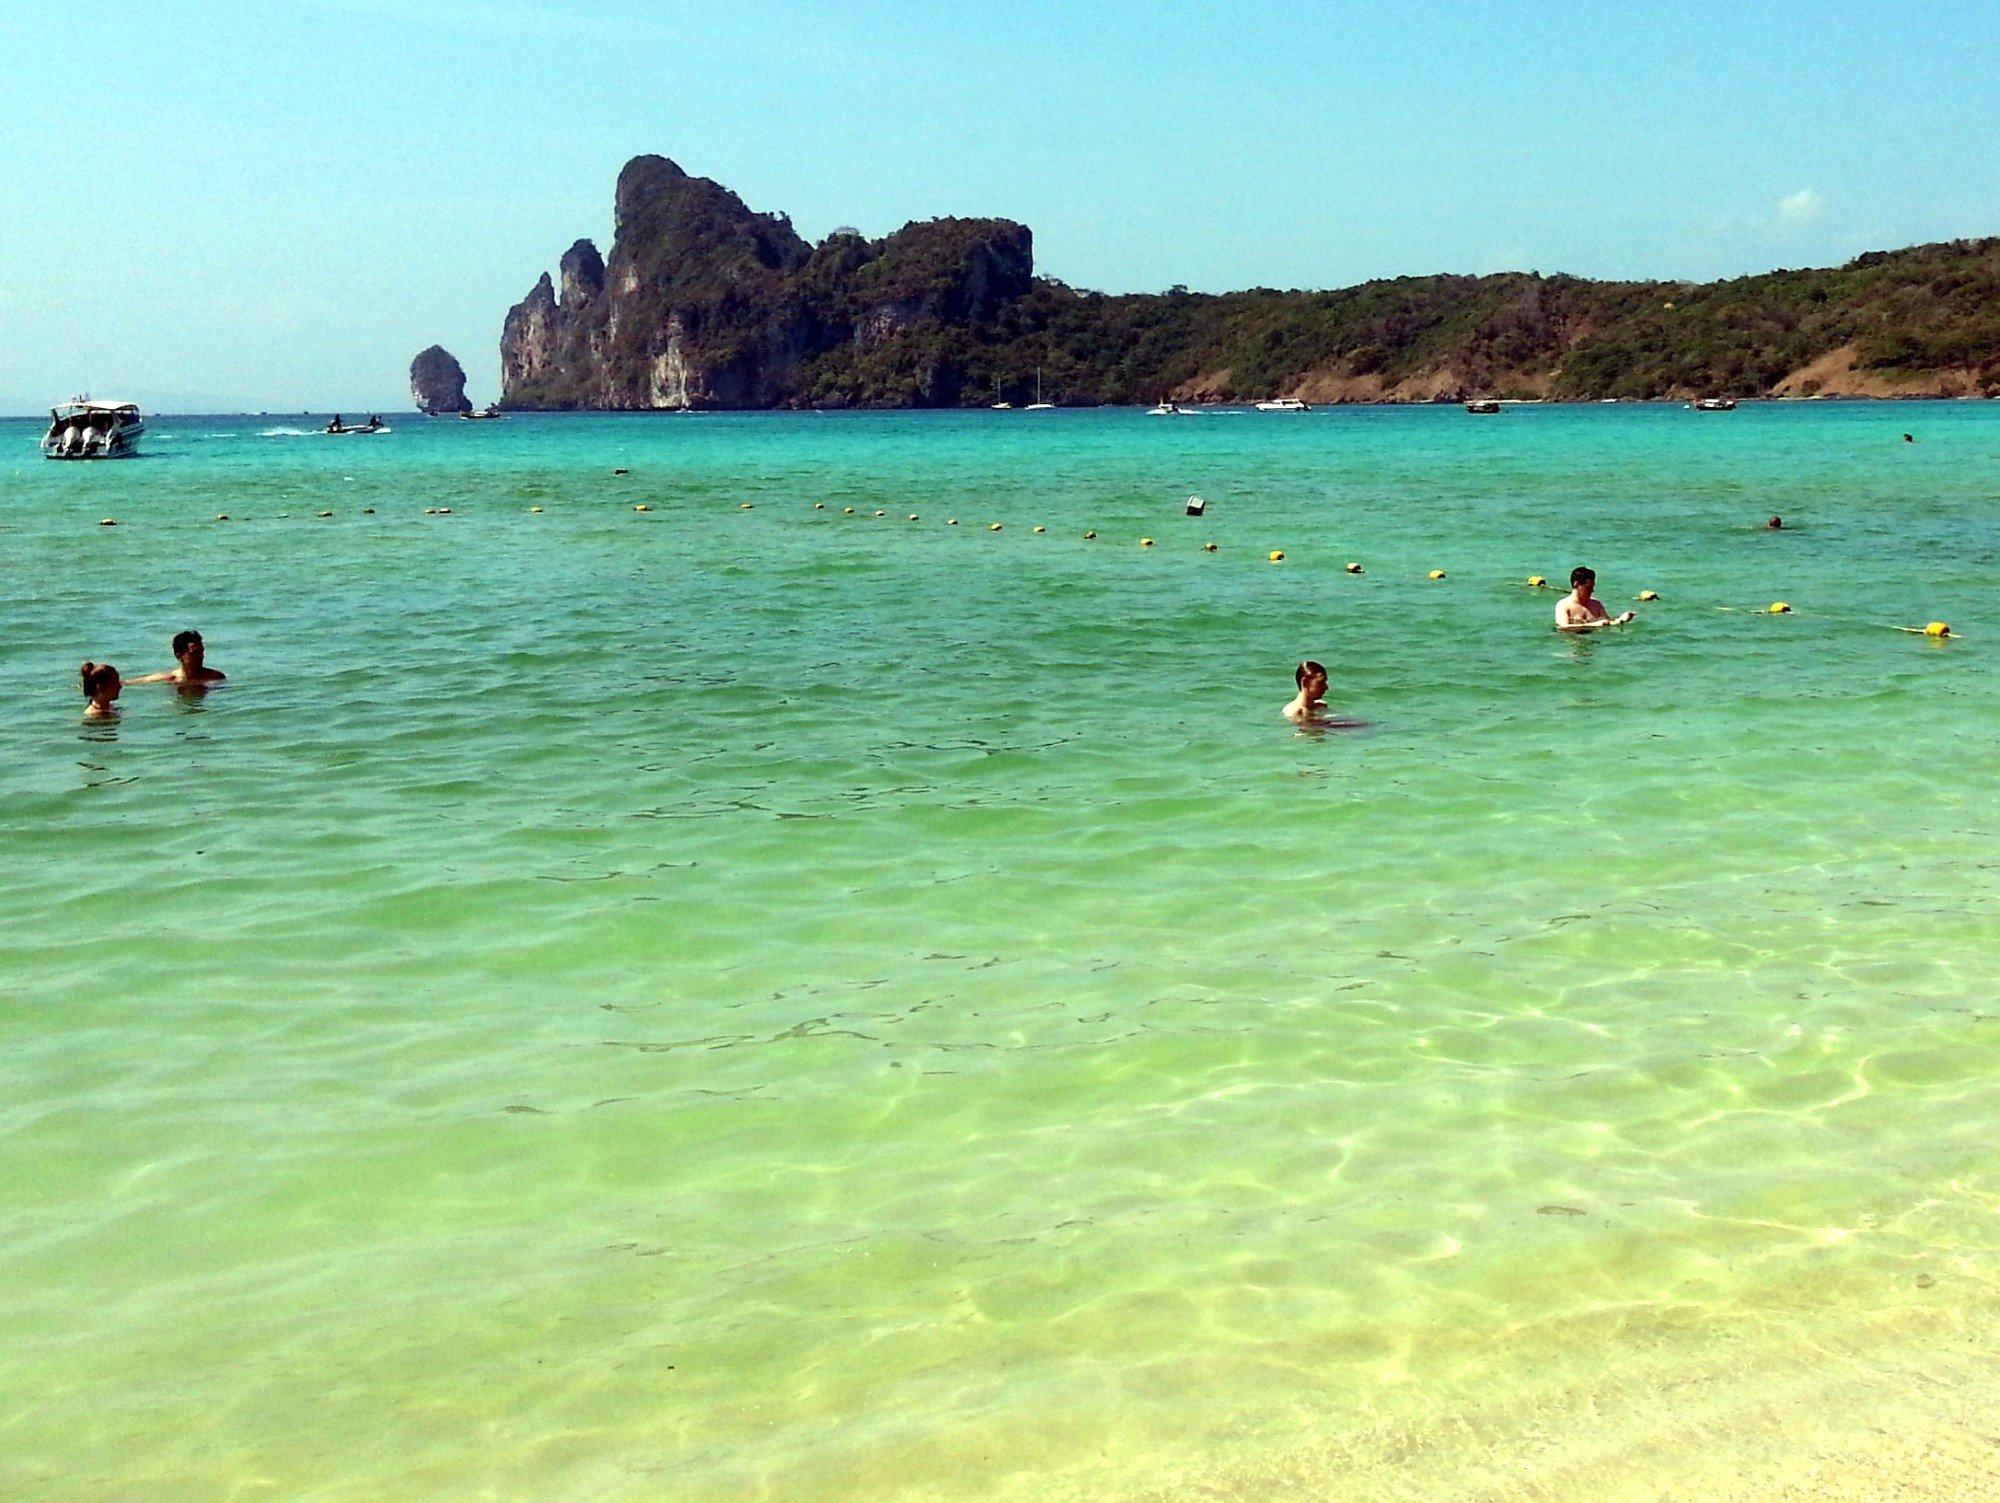 Swimmers on Loh Dalum Beach